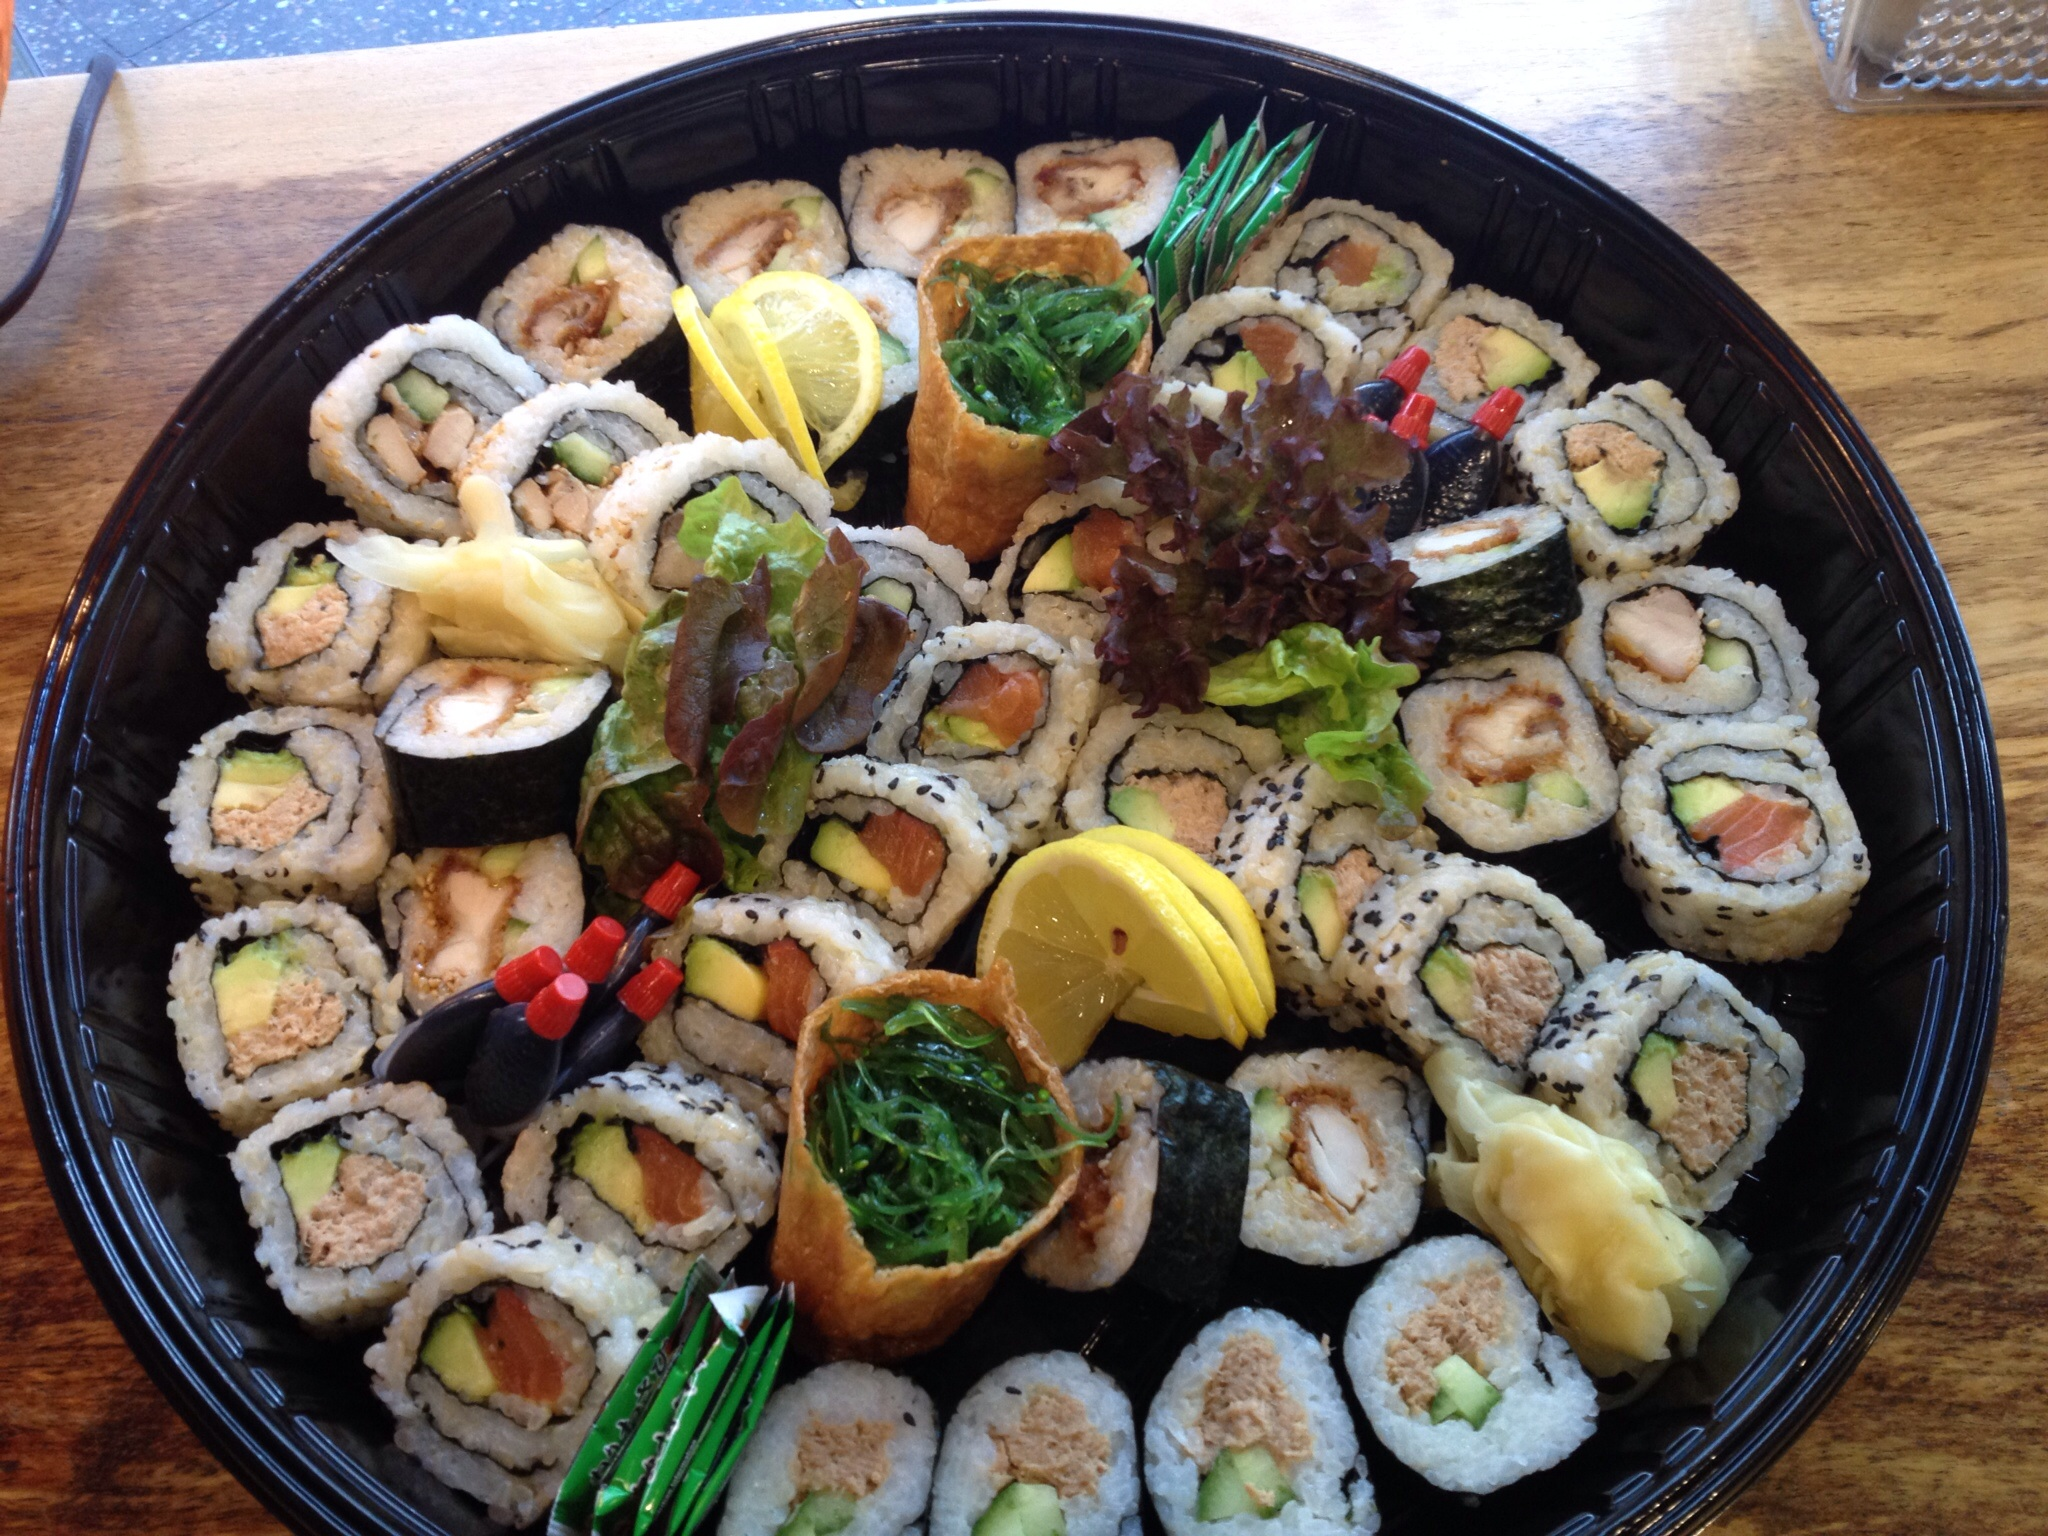 Comida Japonesa  Ingredientes  Culinria  Cultura Mix